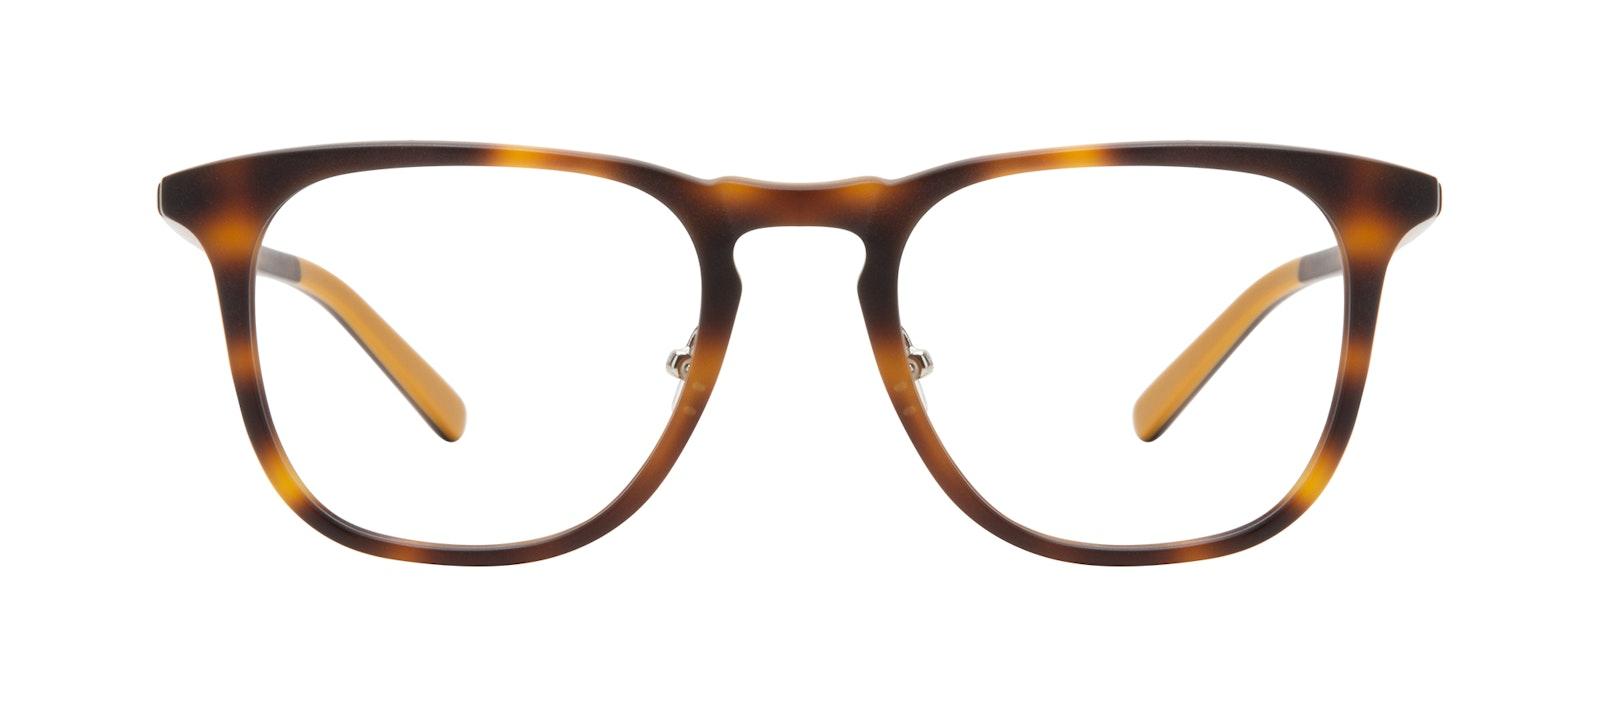 Affordable Fashion Glasses Square Eyeglasses Men Shore Tortoise Matte Front